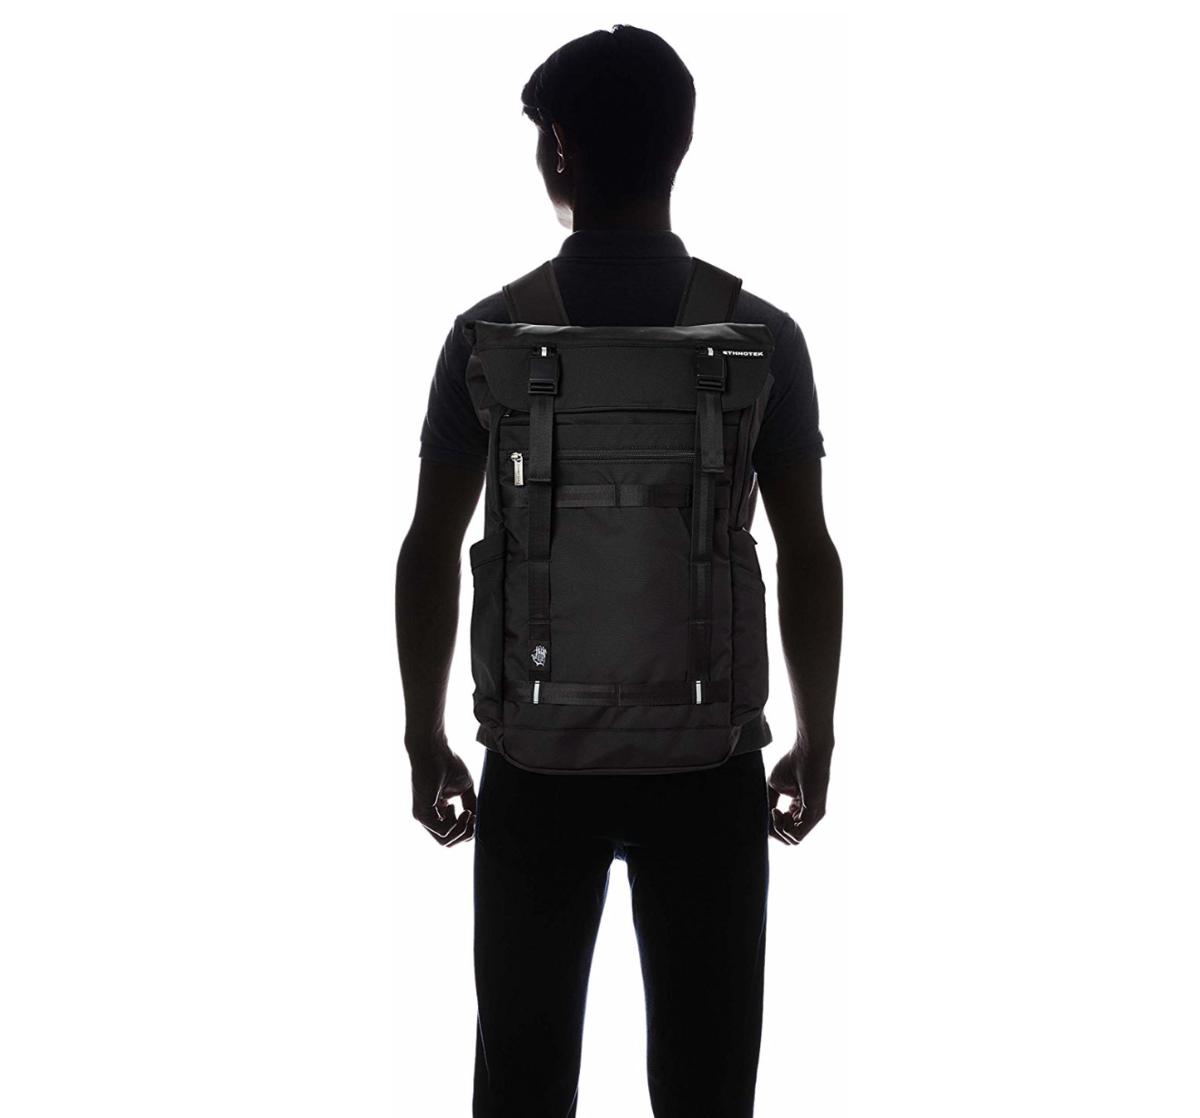 f:id:thebackpack:20190608122212p:plain